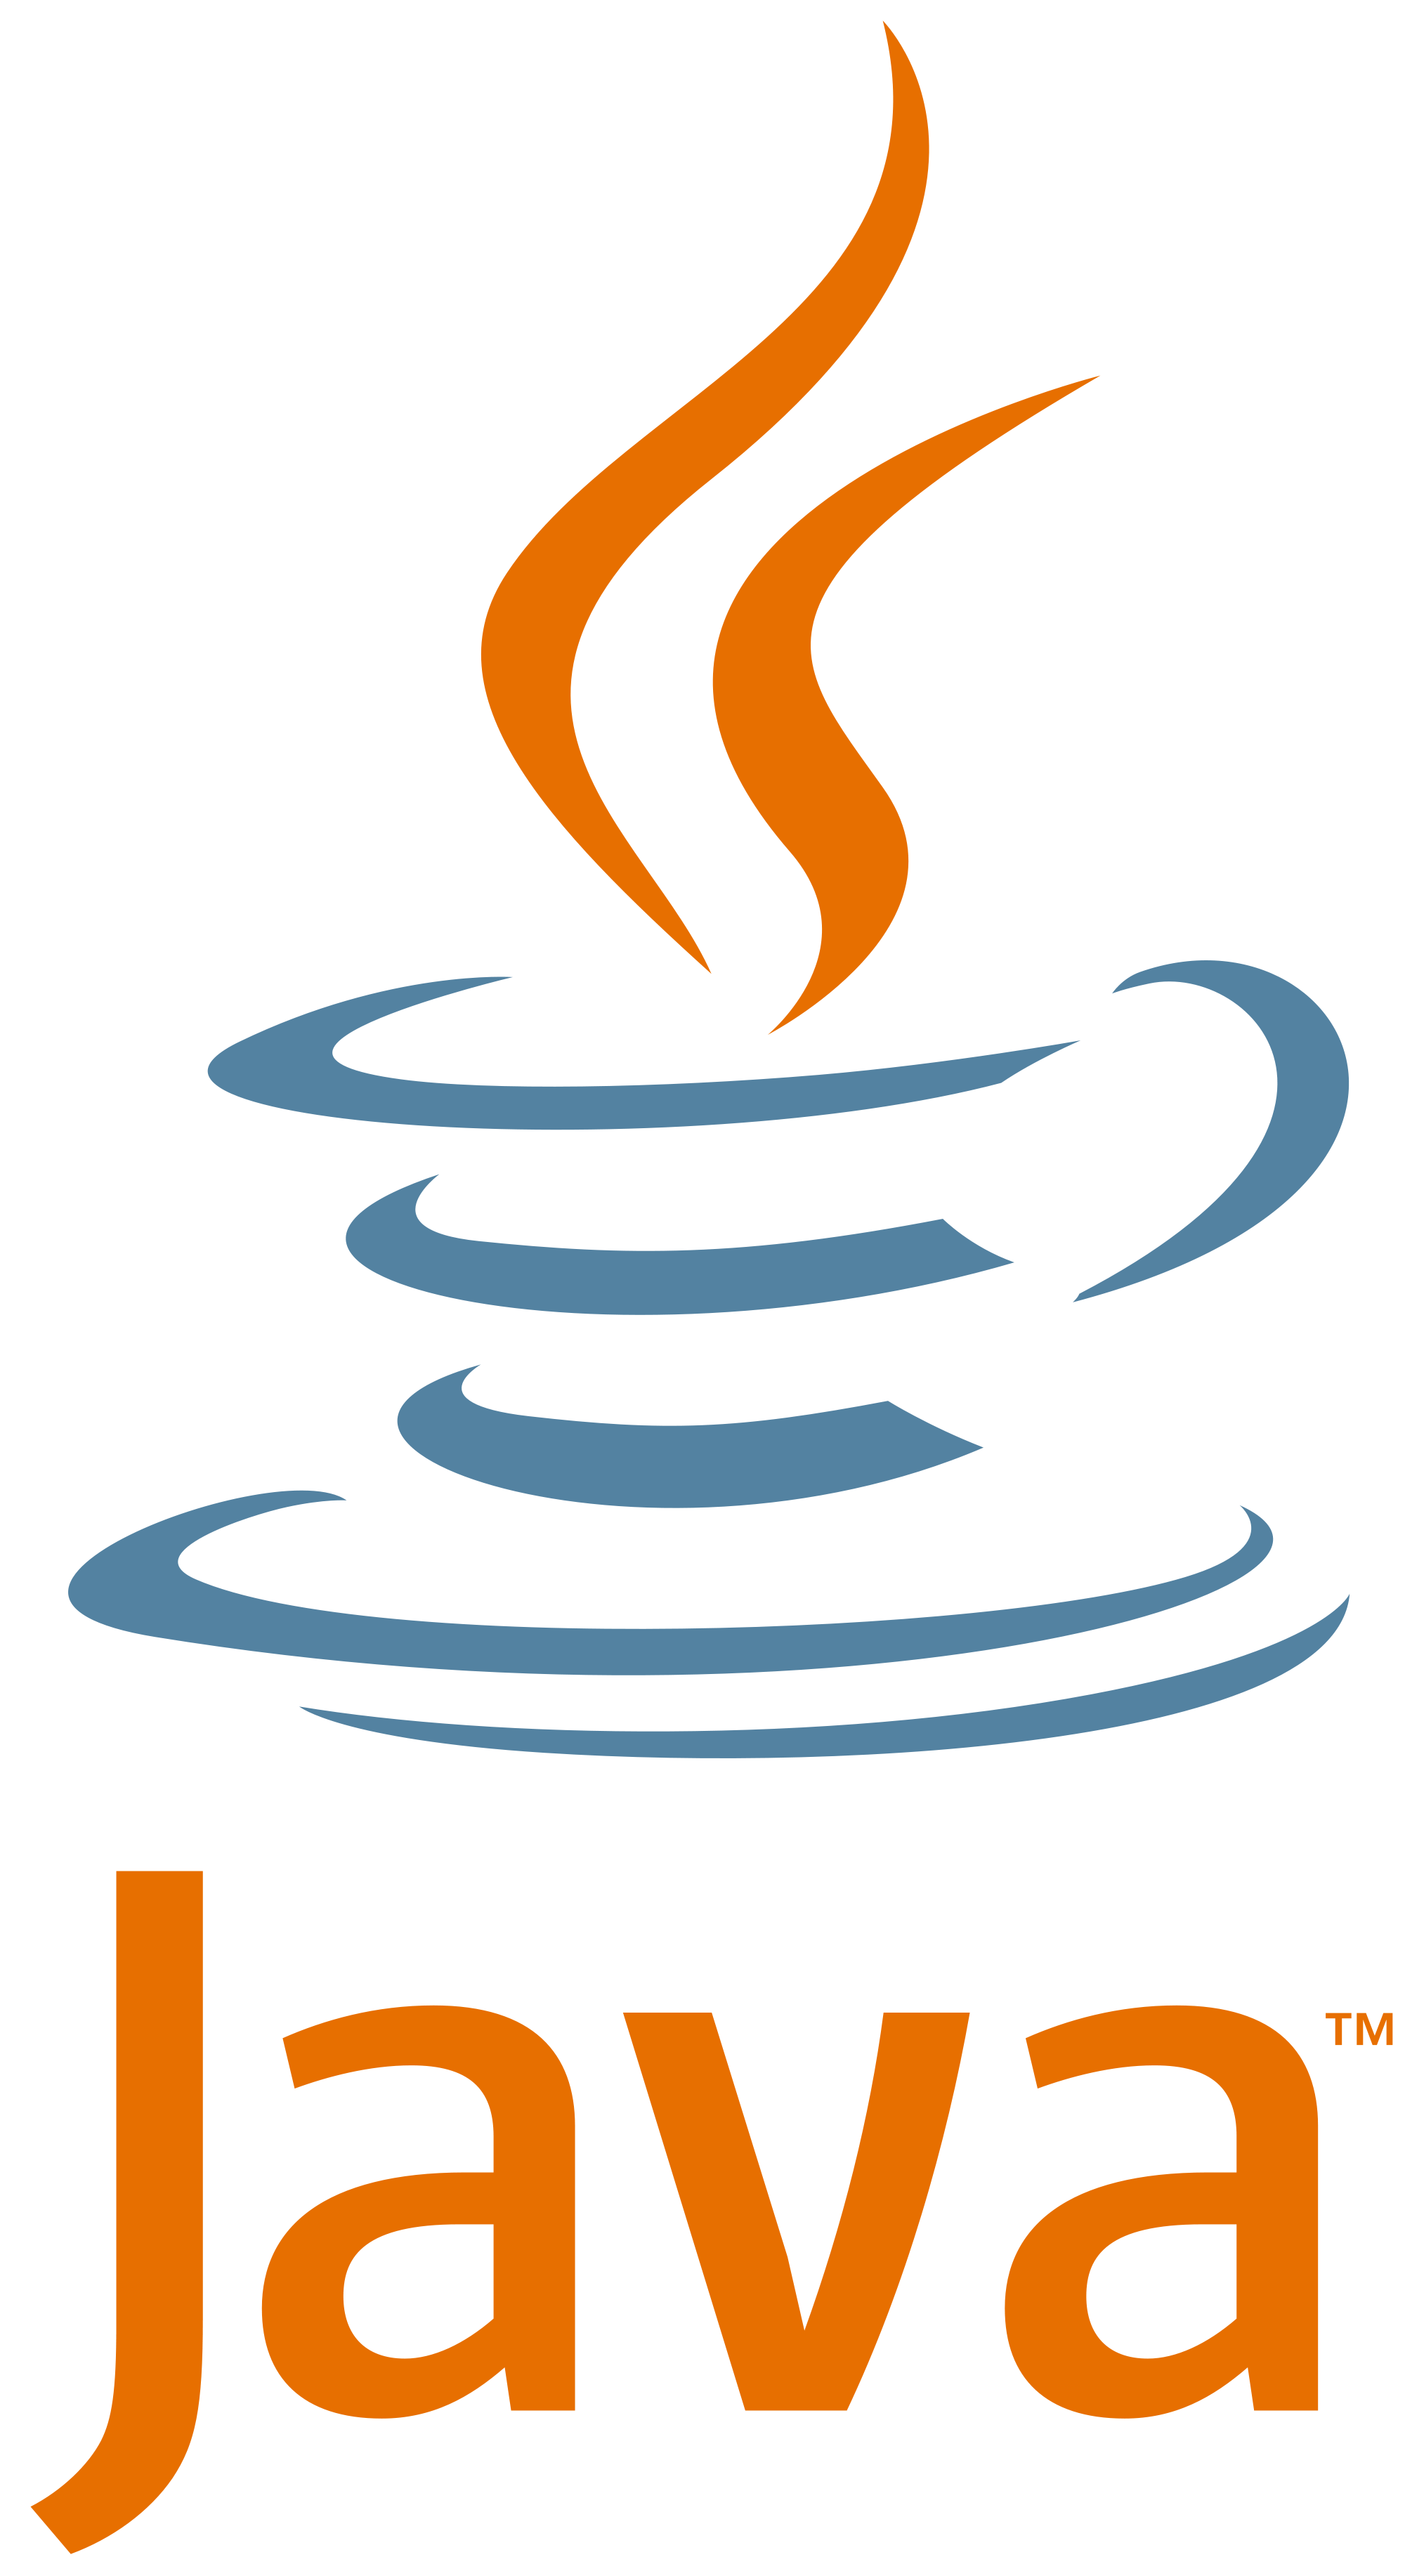 Java PNG Transparent Images #2386614-Java PNG Transparent Images #2386614-0